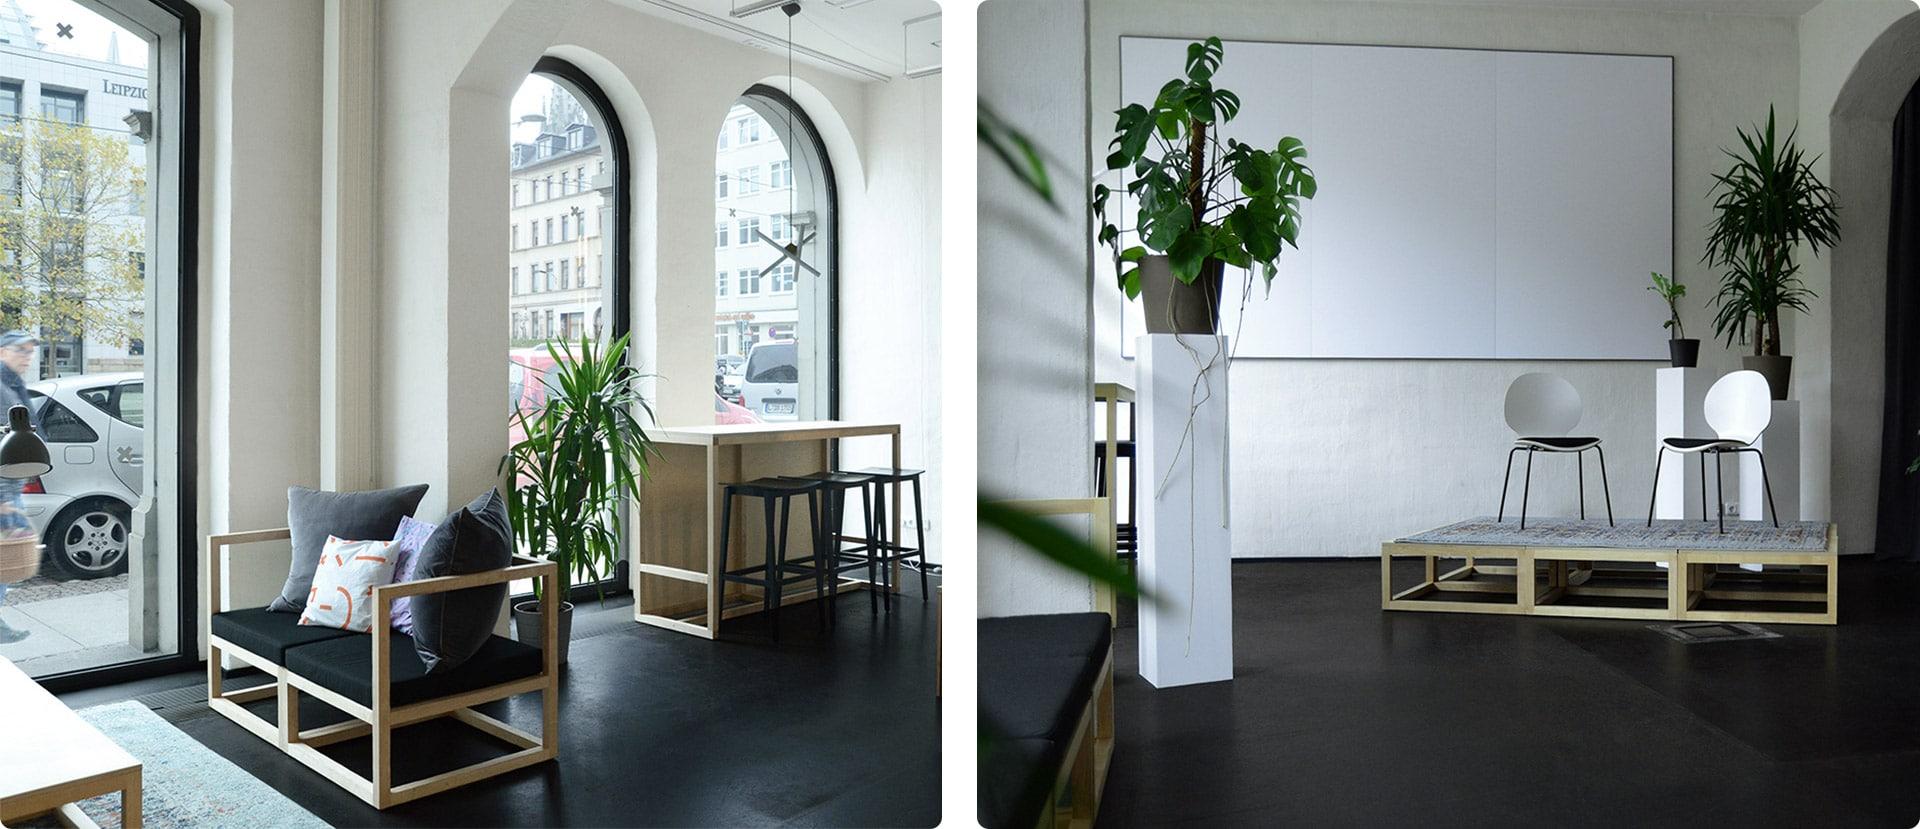 form70-modular-office-funiture-basislager-2